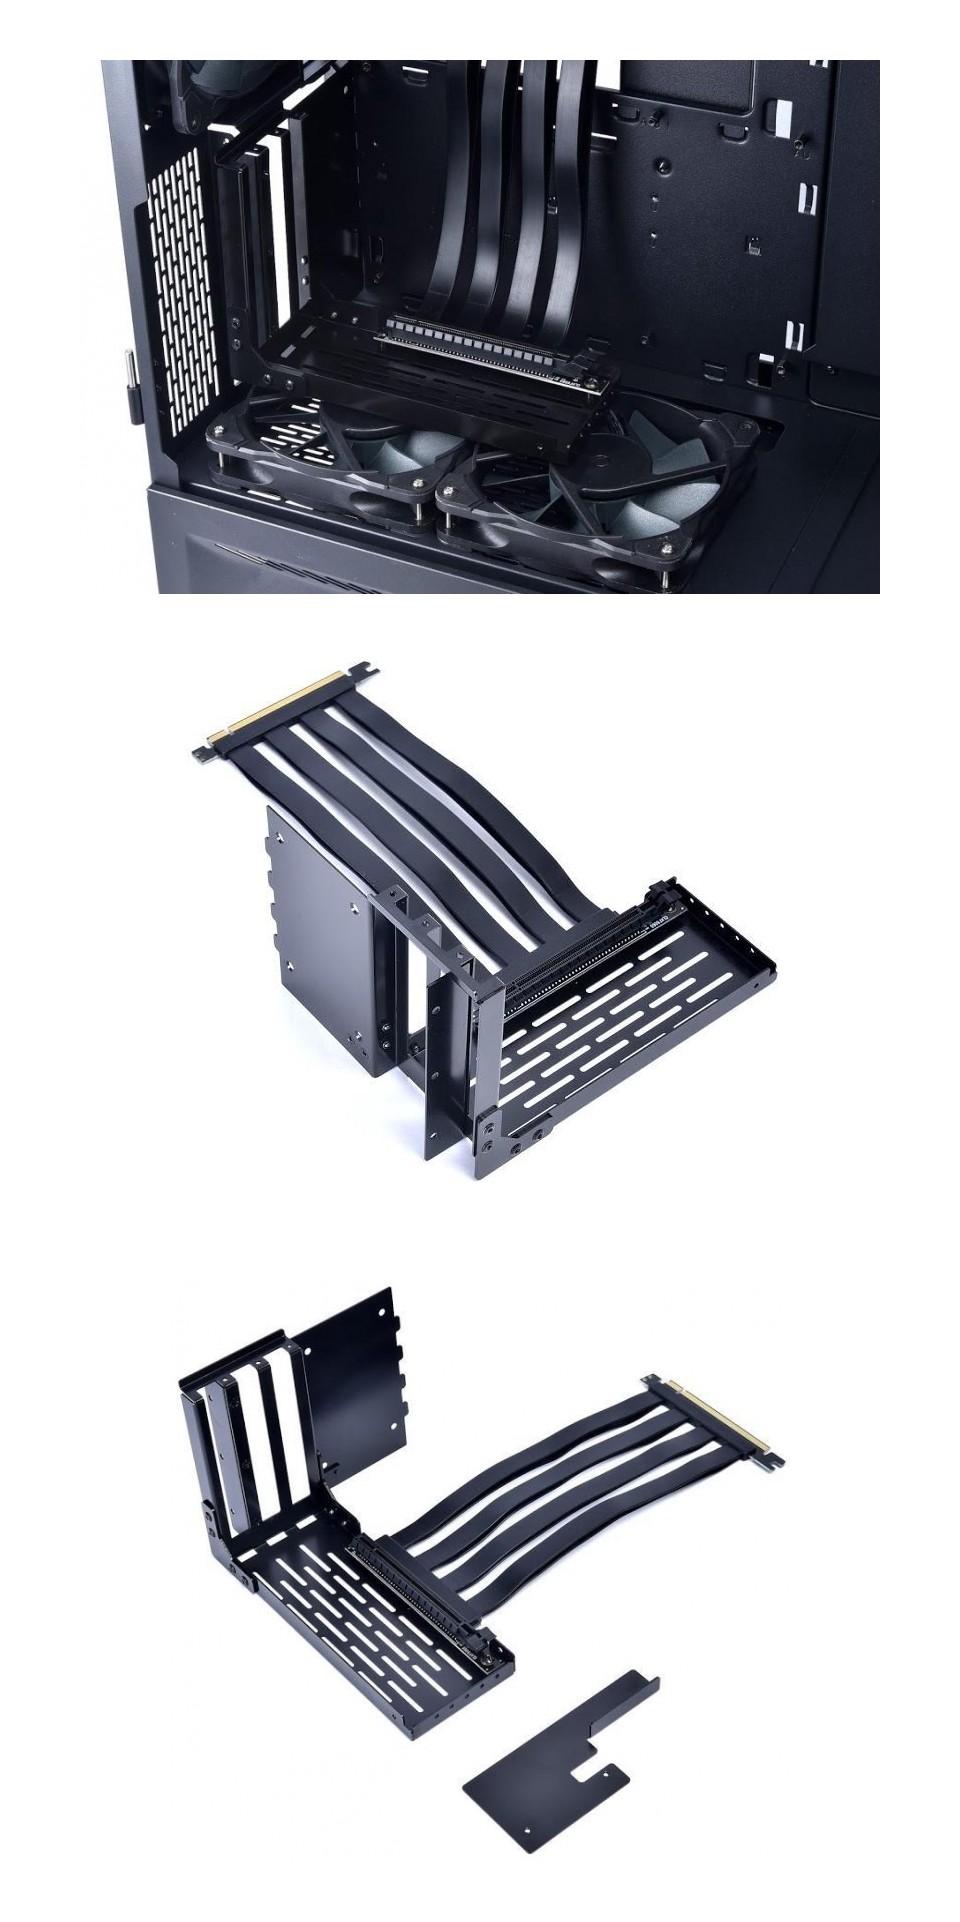 Lian Li Vertical GPU Kit For Lancool Two product